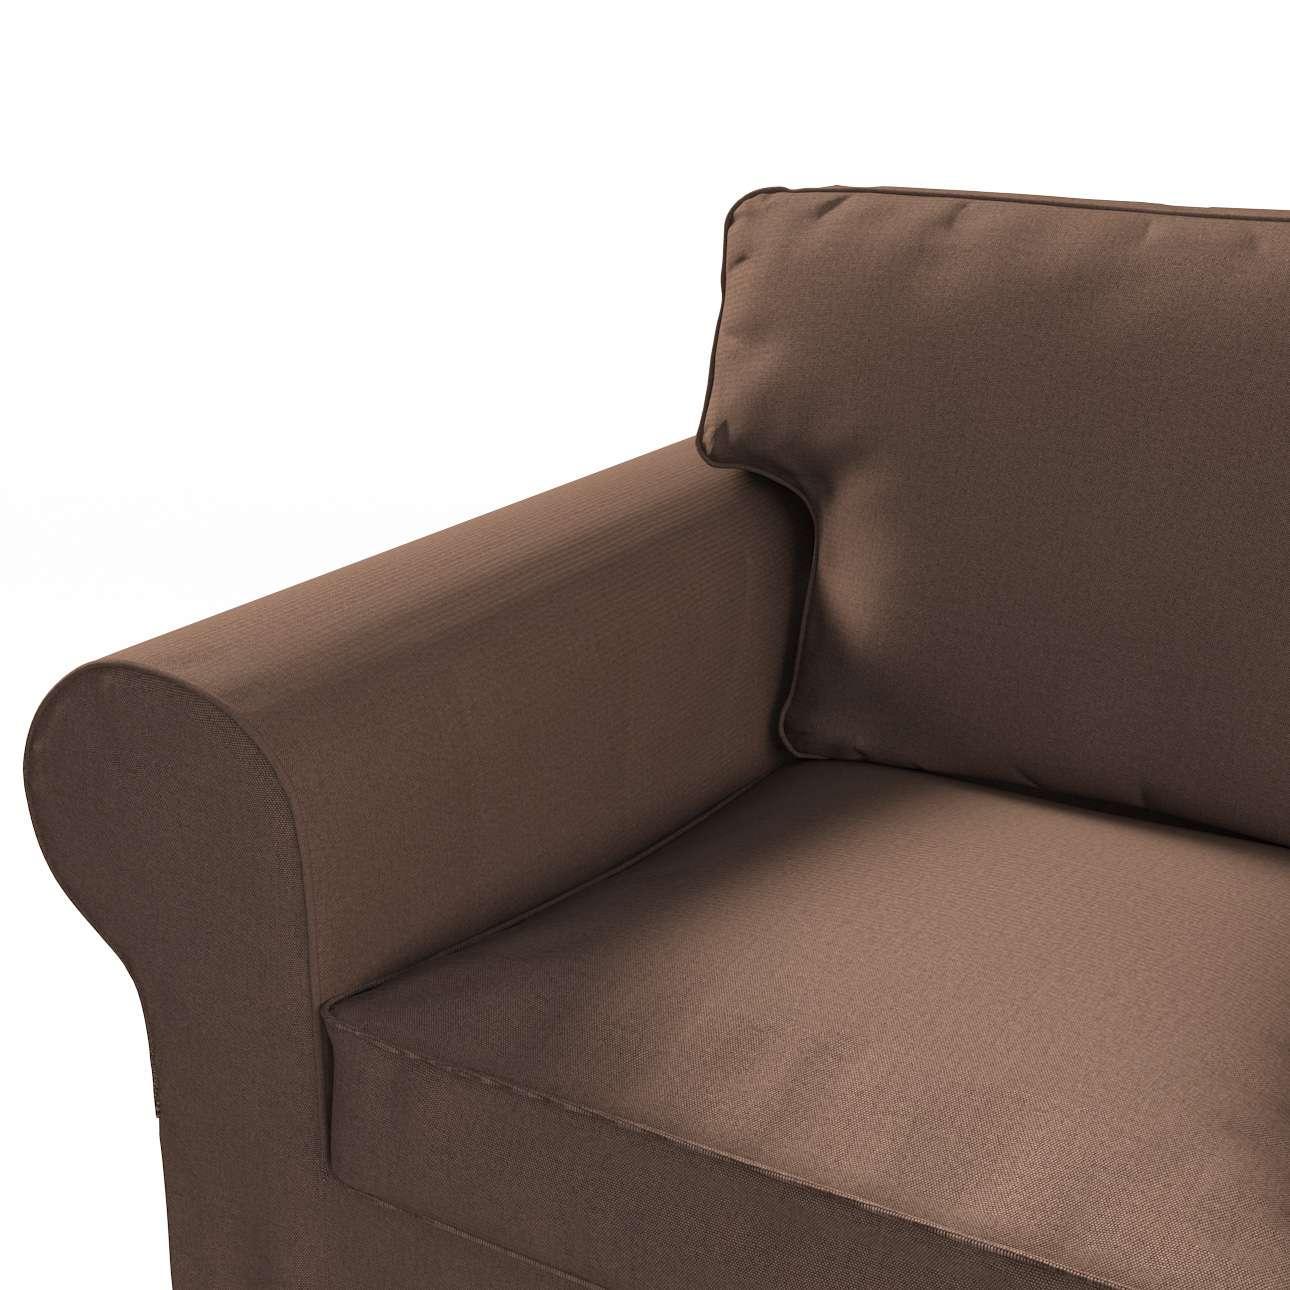 Ektorp 3-Sitzer Schlafsofabezug, ALTES Modell Sofahusse Ektorp 3-Sitzer Schlafsofa von der Kollektion Etna, Stoff: 705-08